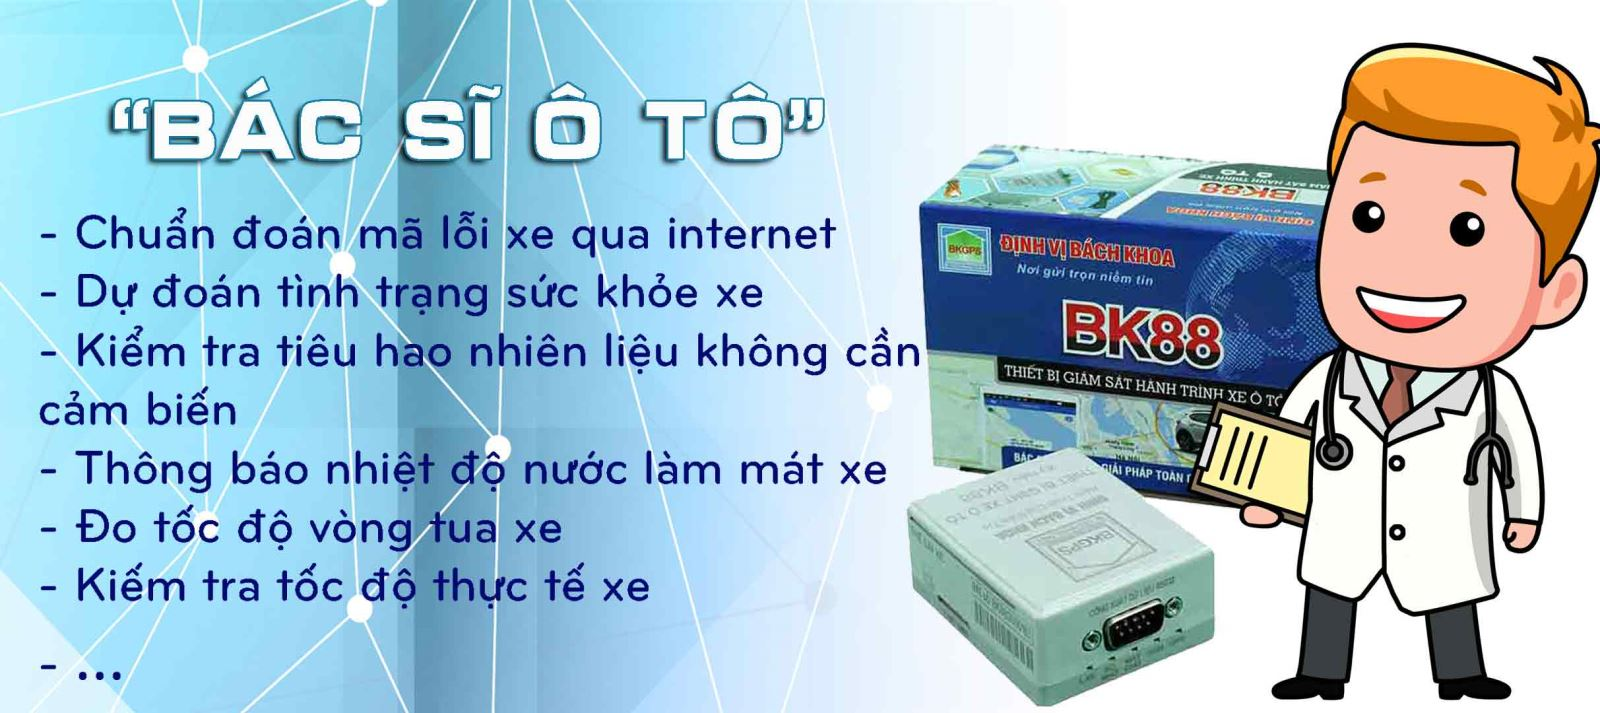 https://dinhvibachkhoa.vn/Images/photo/Articlefiles/anh-bia-dinh-vi-bach-khoa-05.jpg